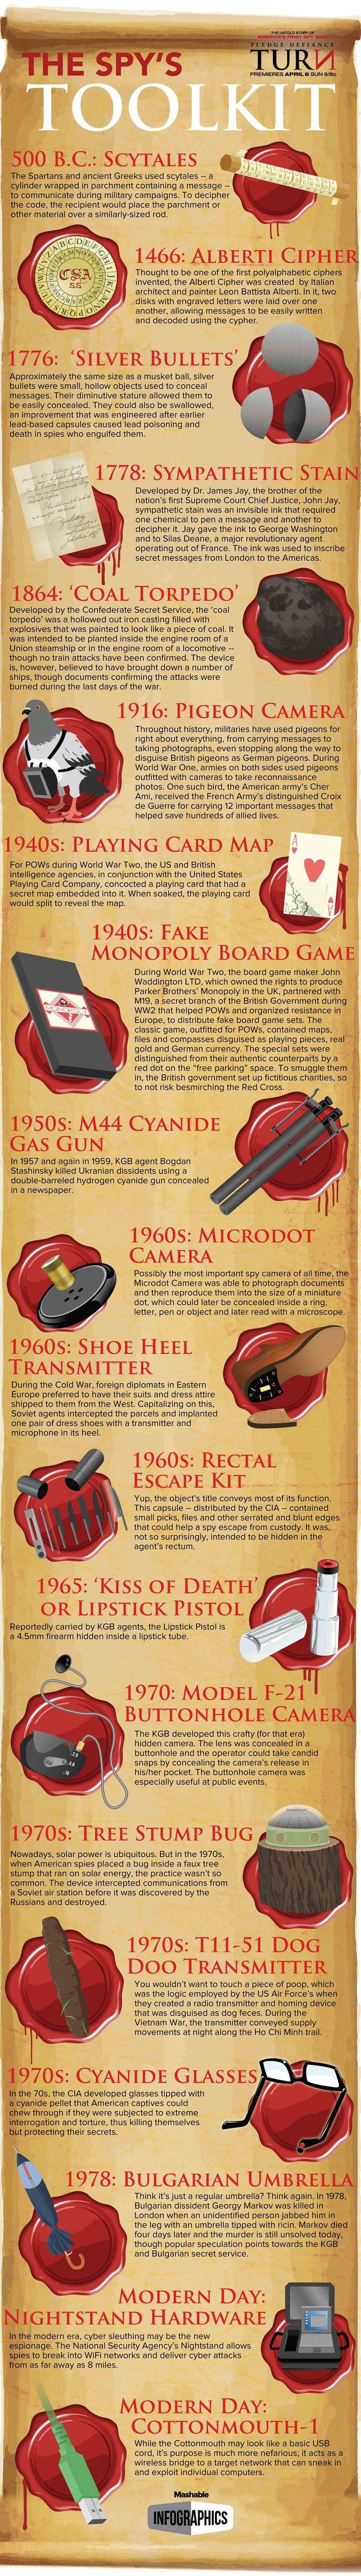 Best 25 Spy Gadgets Ideas On Pinterest